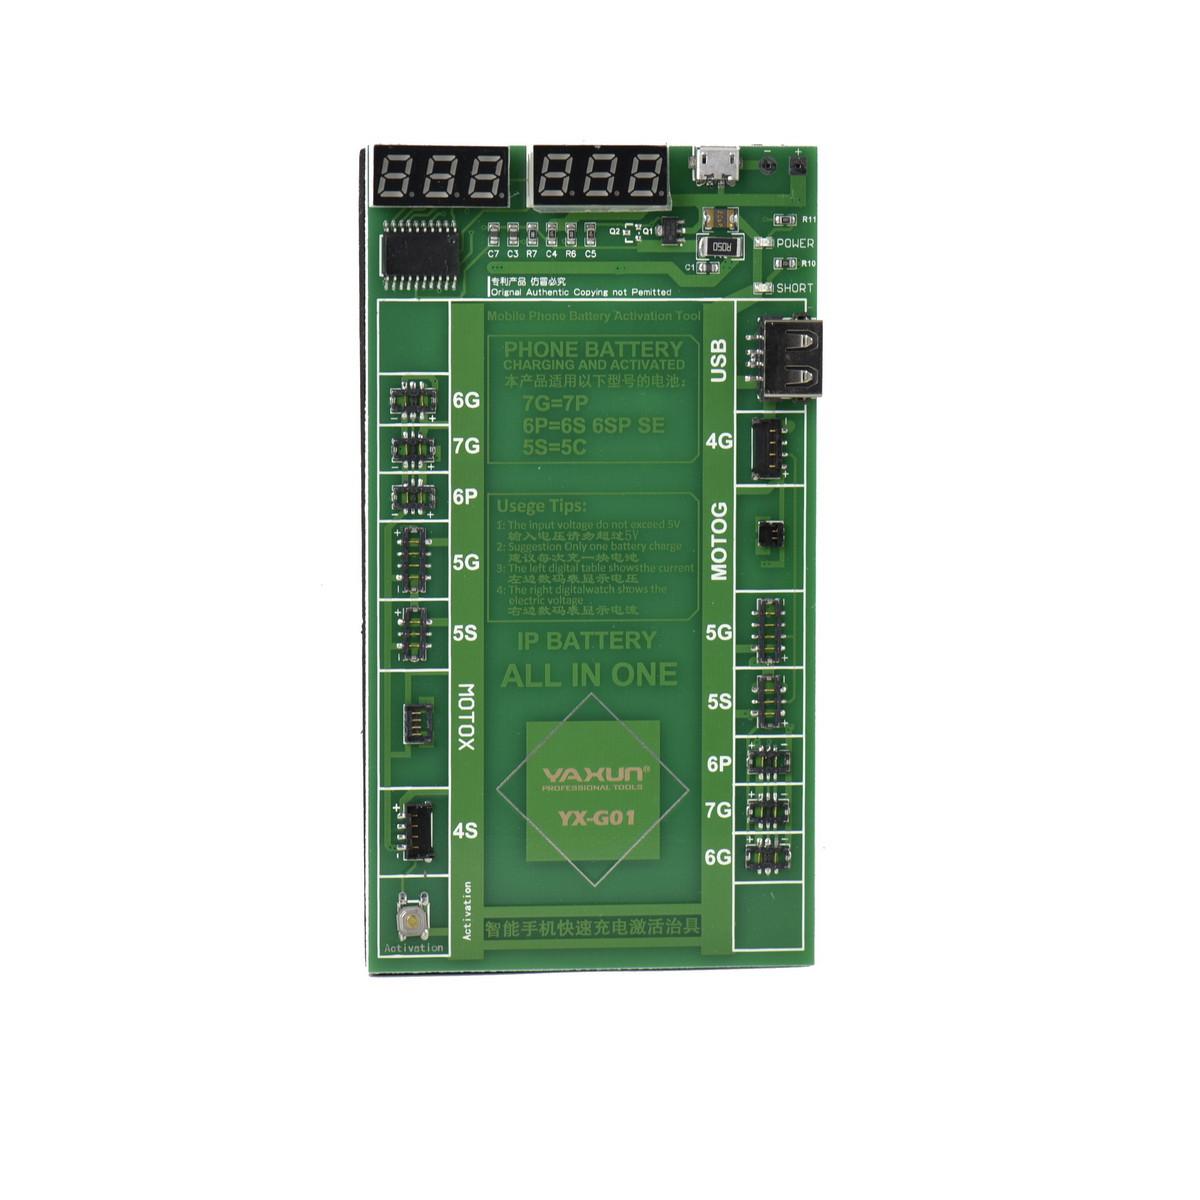 Активатор аккумулятора Ya Xun YX-G01 для Iphone 4G/4S/5G/5S/5SE/6G/6PLUS/6S/6SPLUS/7G/7Plus